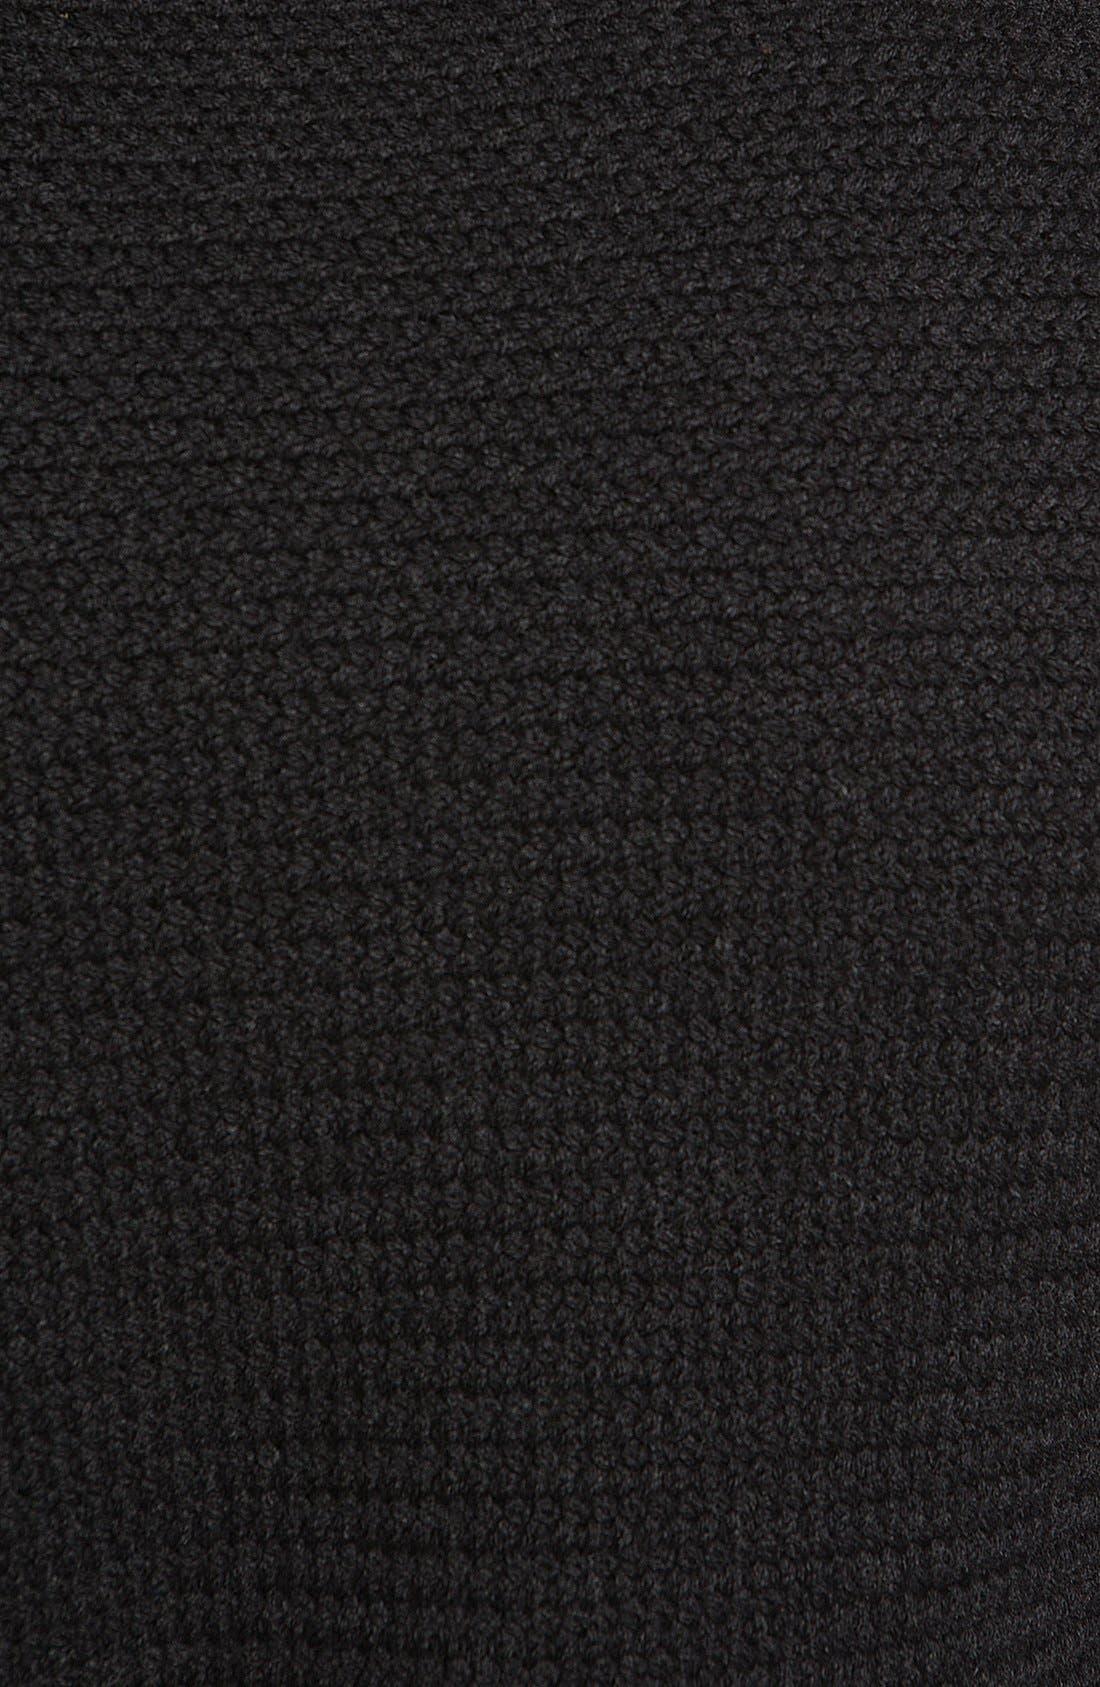 Alternate Image 3  - A.P.C. Thick Wool Crewneck Sweater